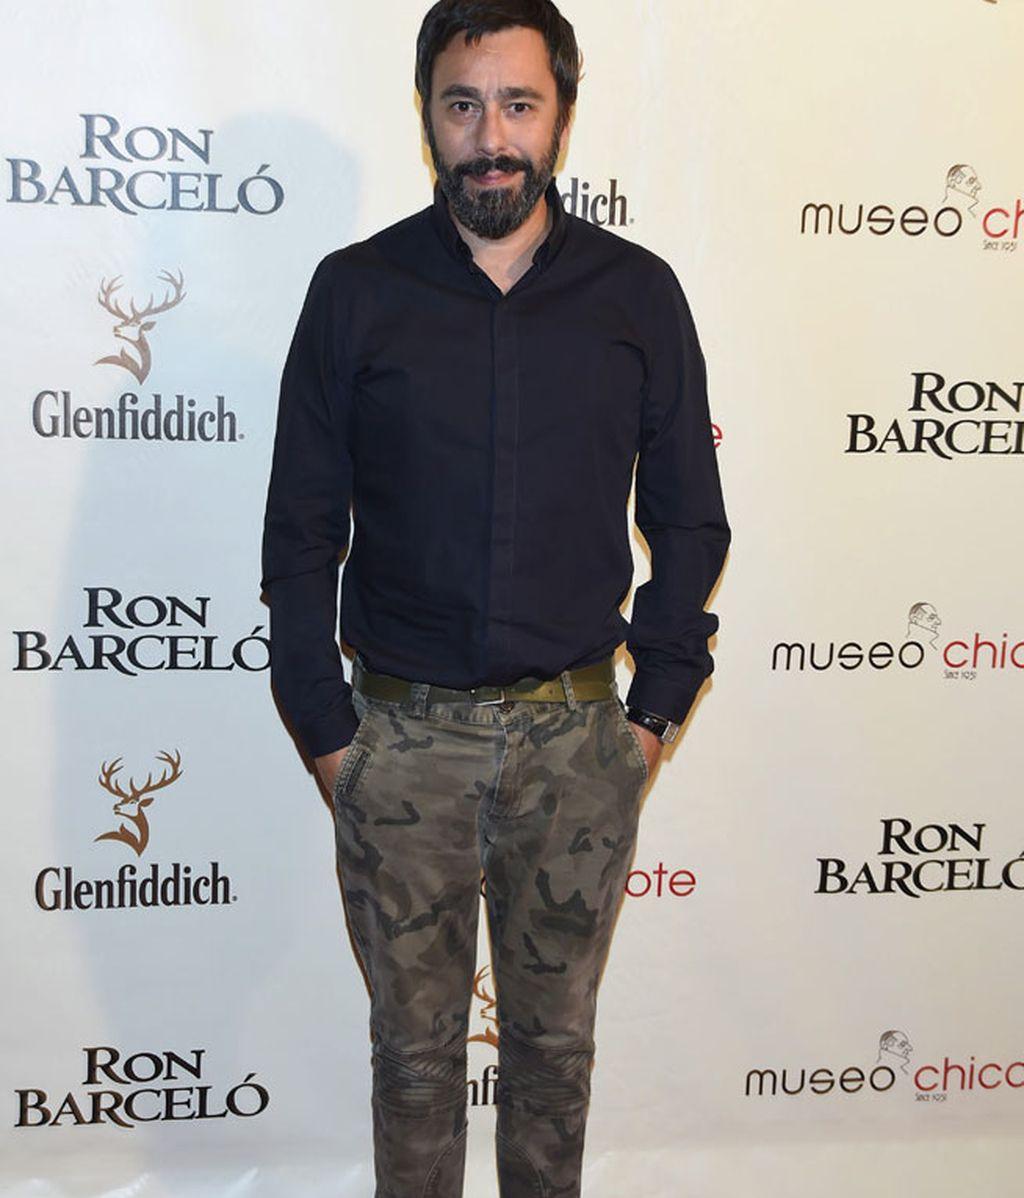 Juanjo Oliva, camisa oscura y pantalones militares